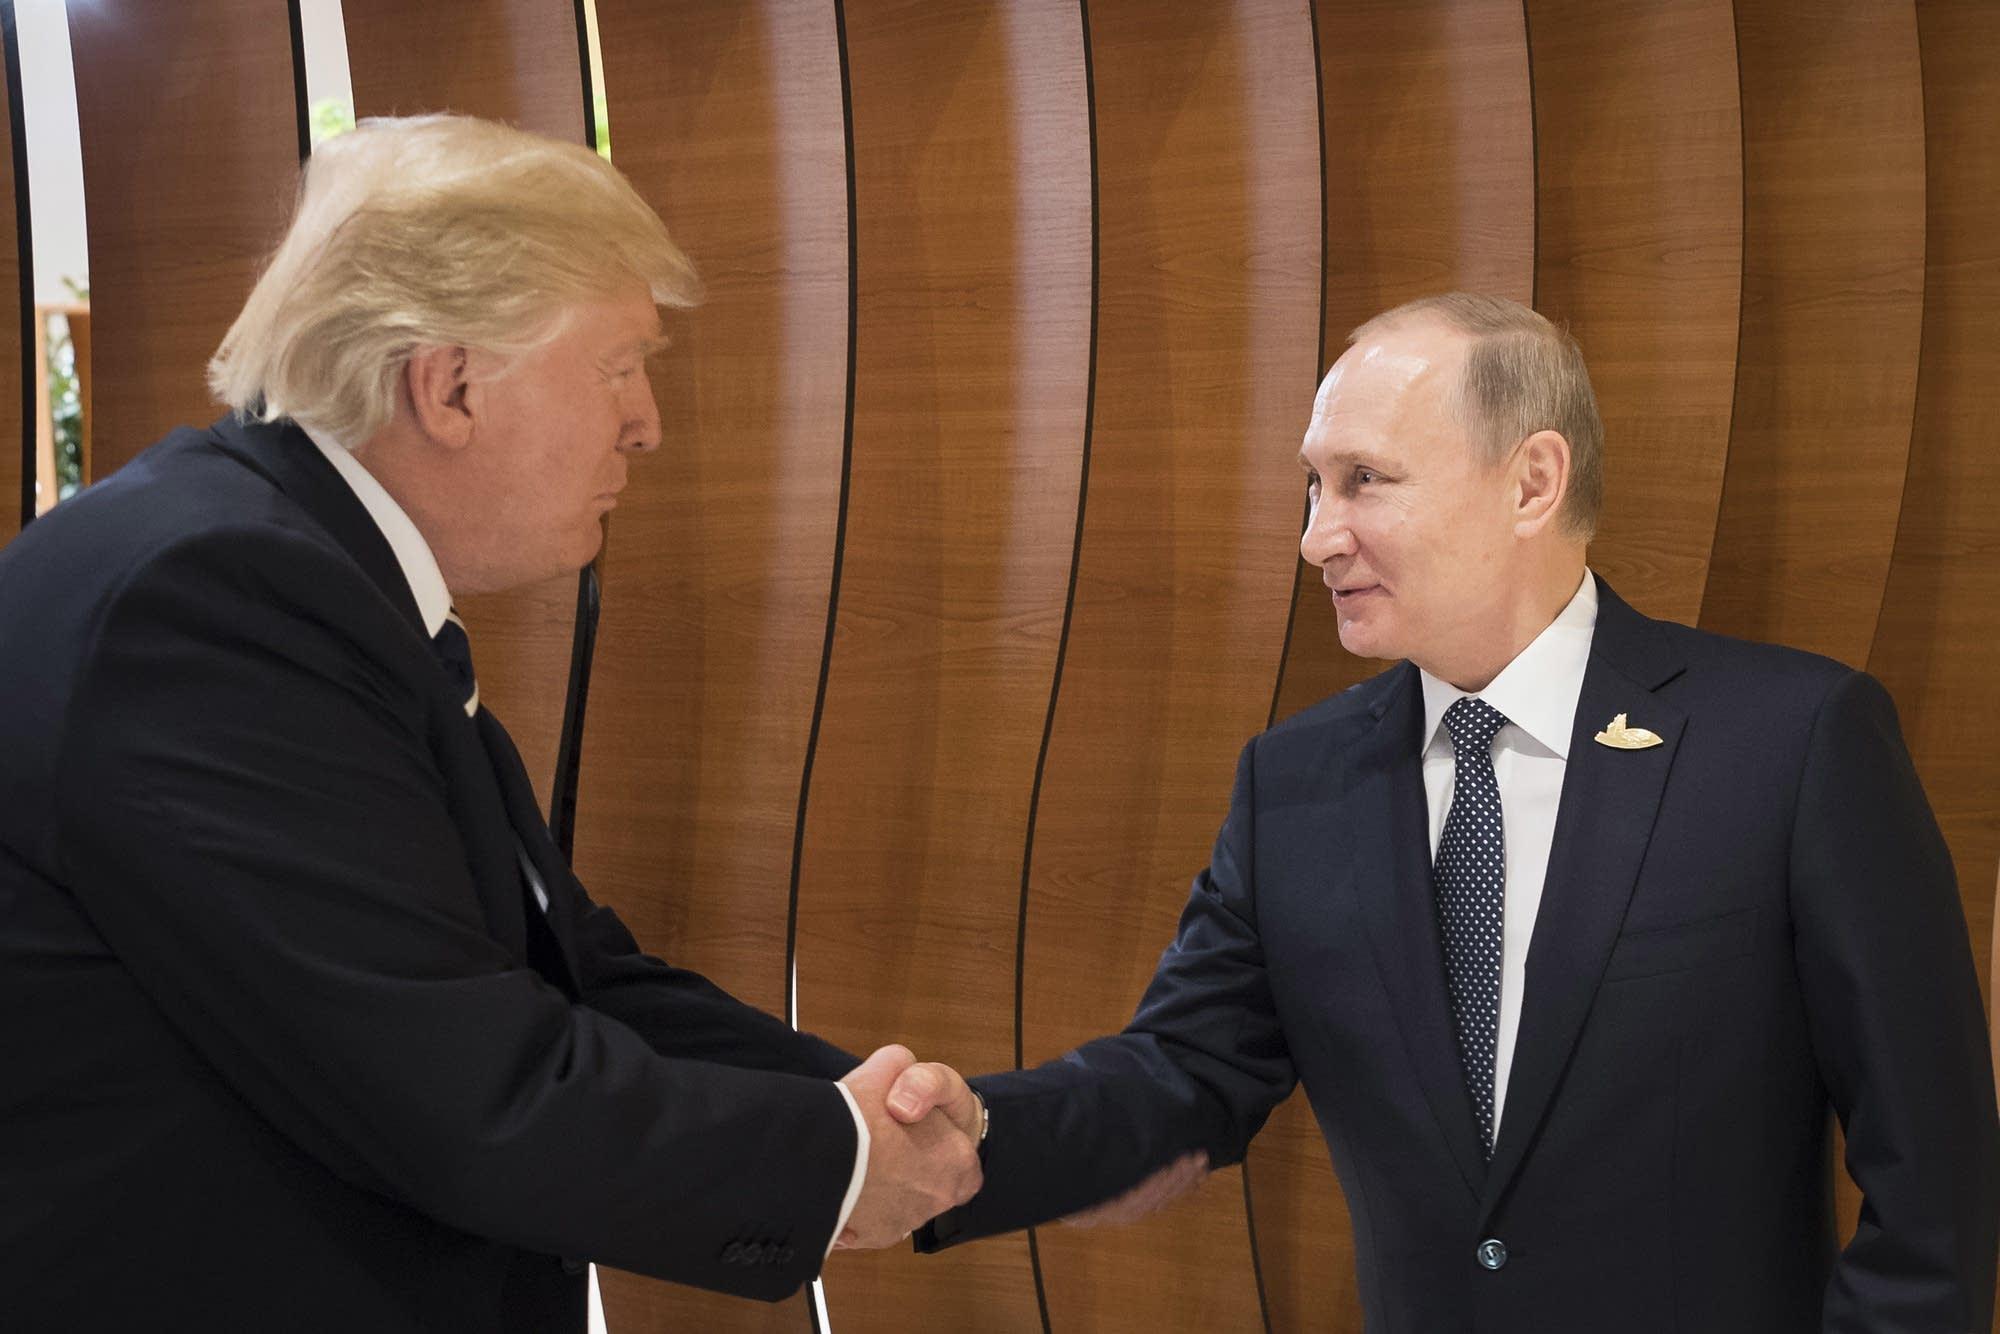 President Trump and President Putin